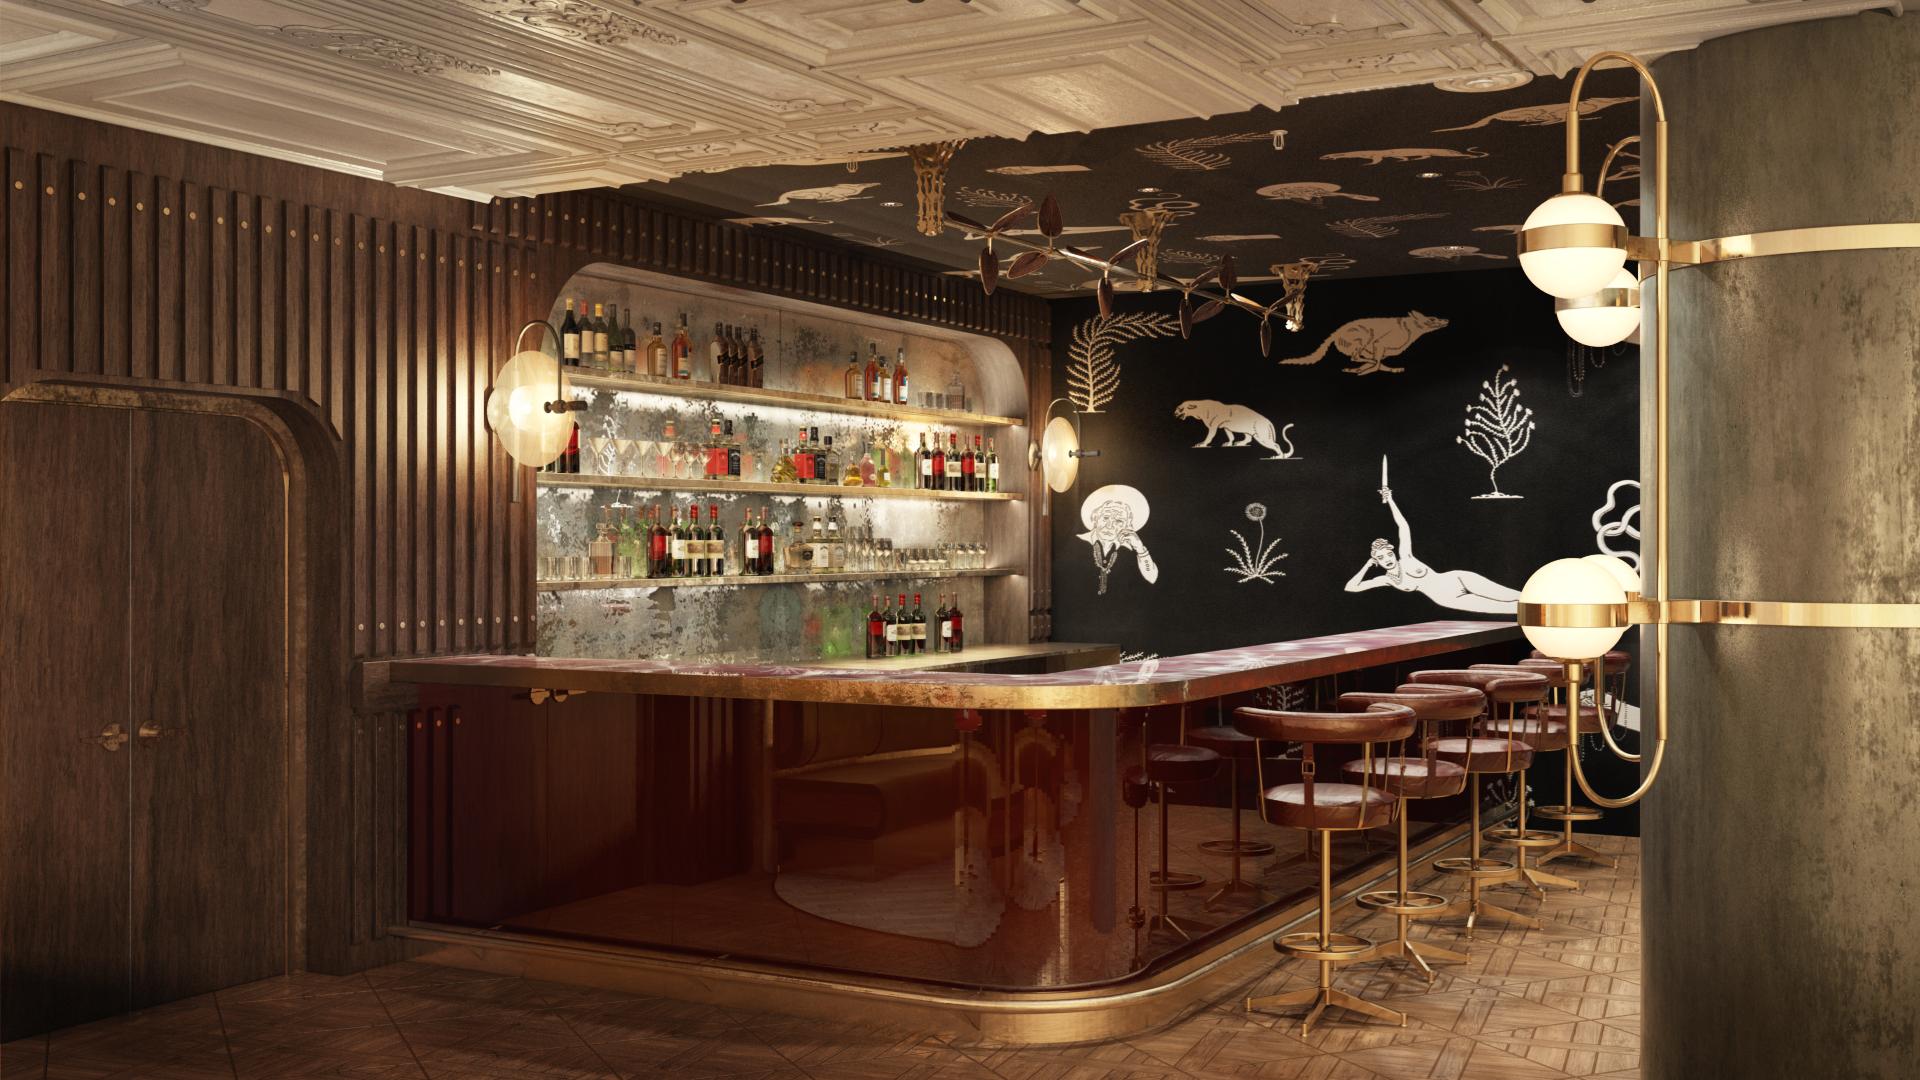 3D Visualization for a Restaurant Interior Design View